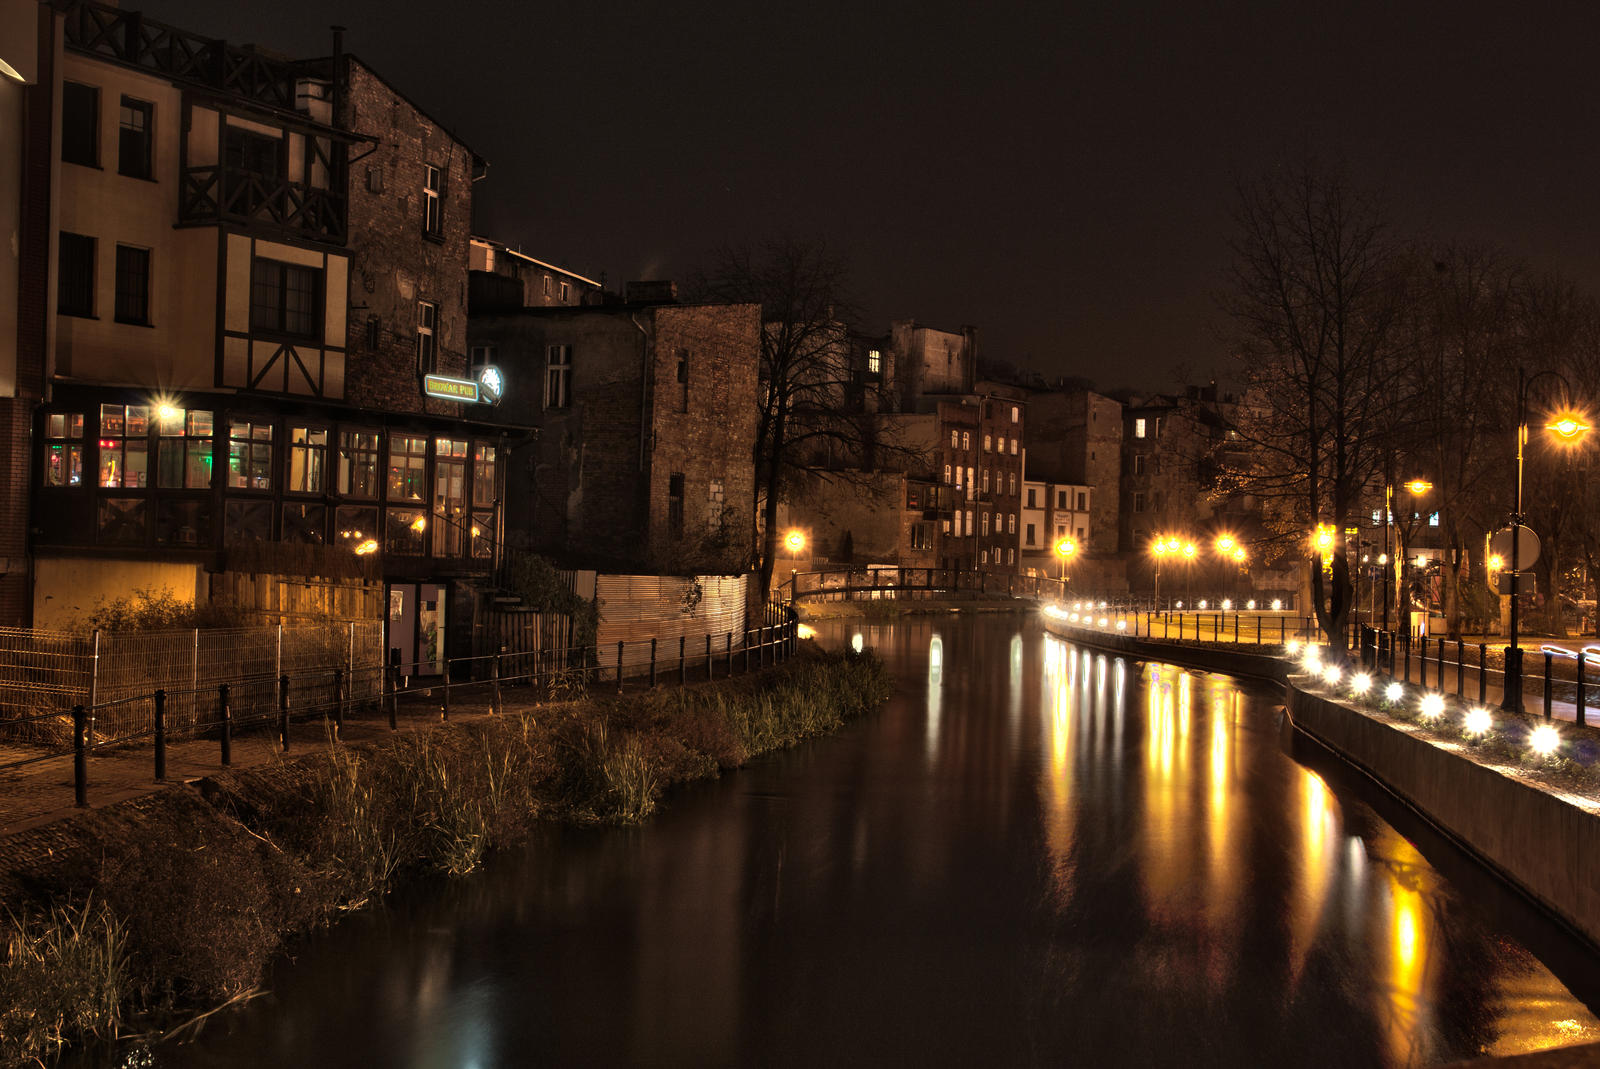 Bydgoszcz Venice at Night by hutuu